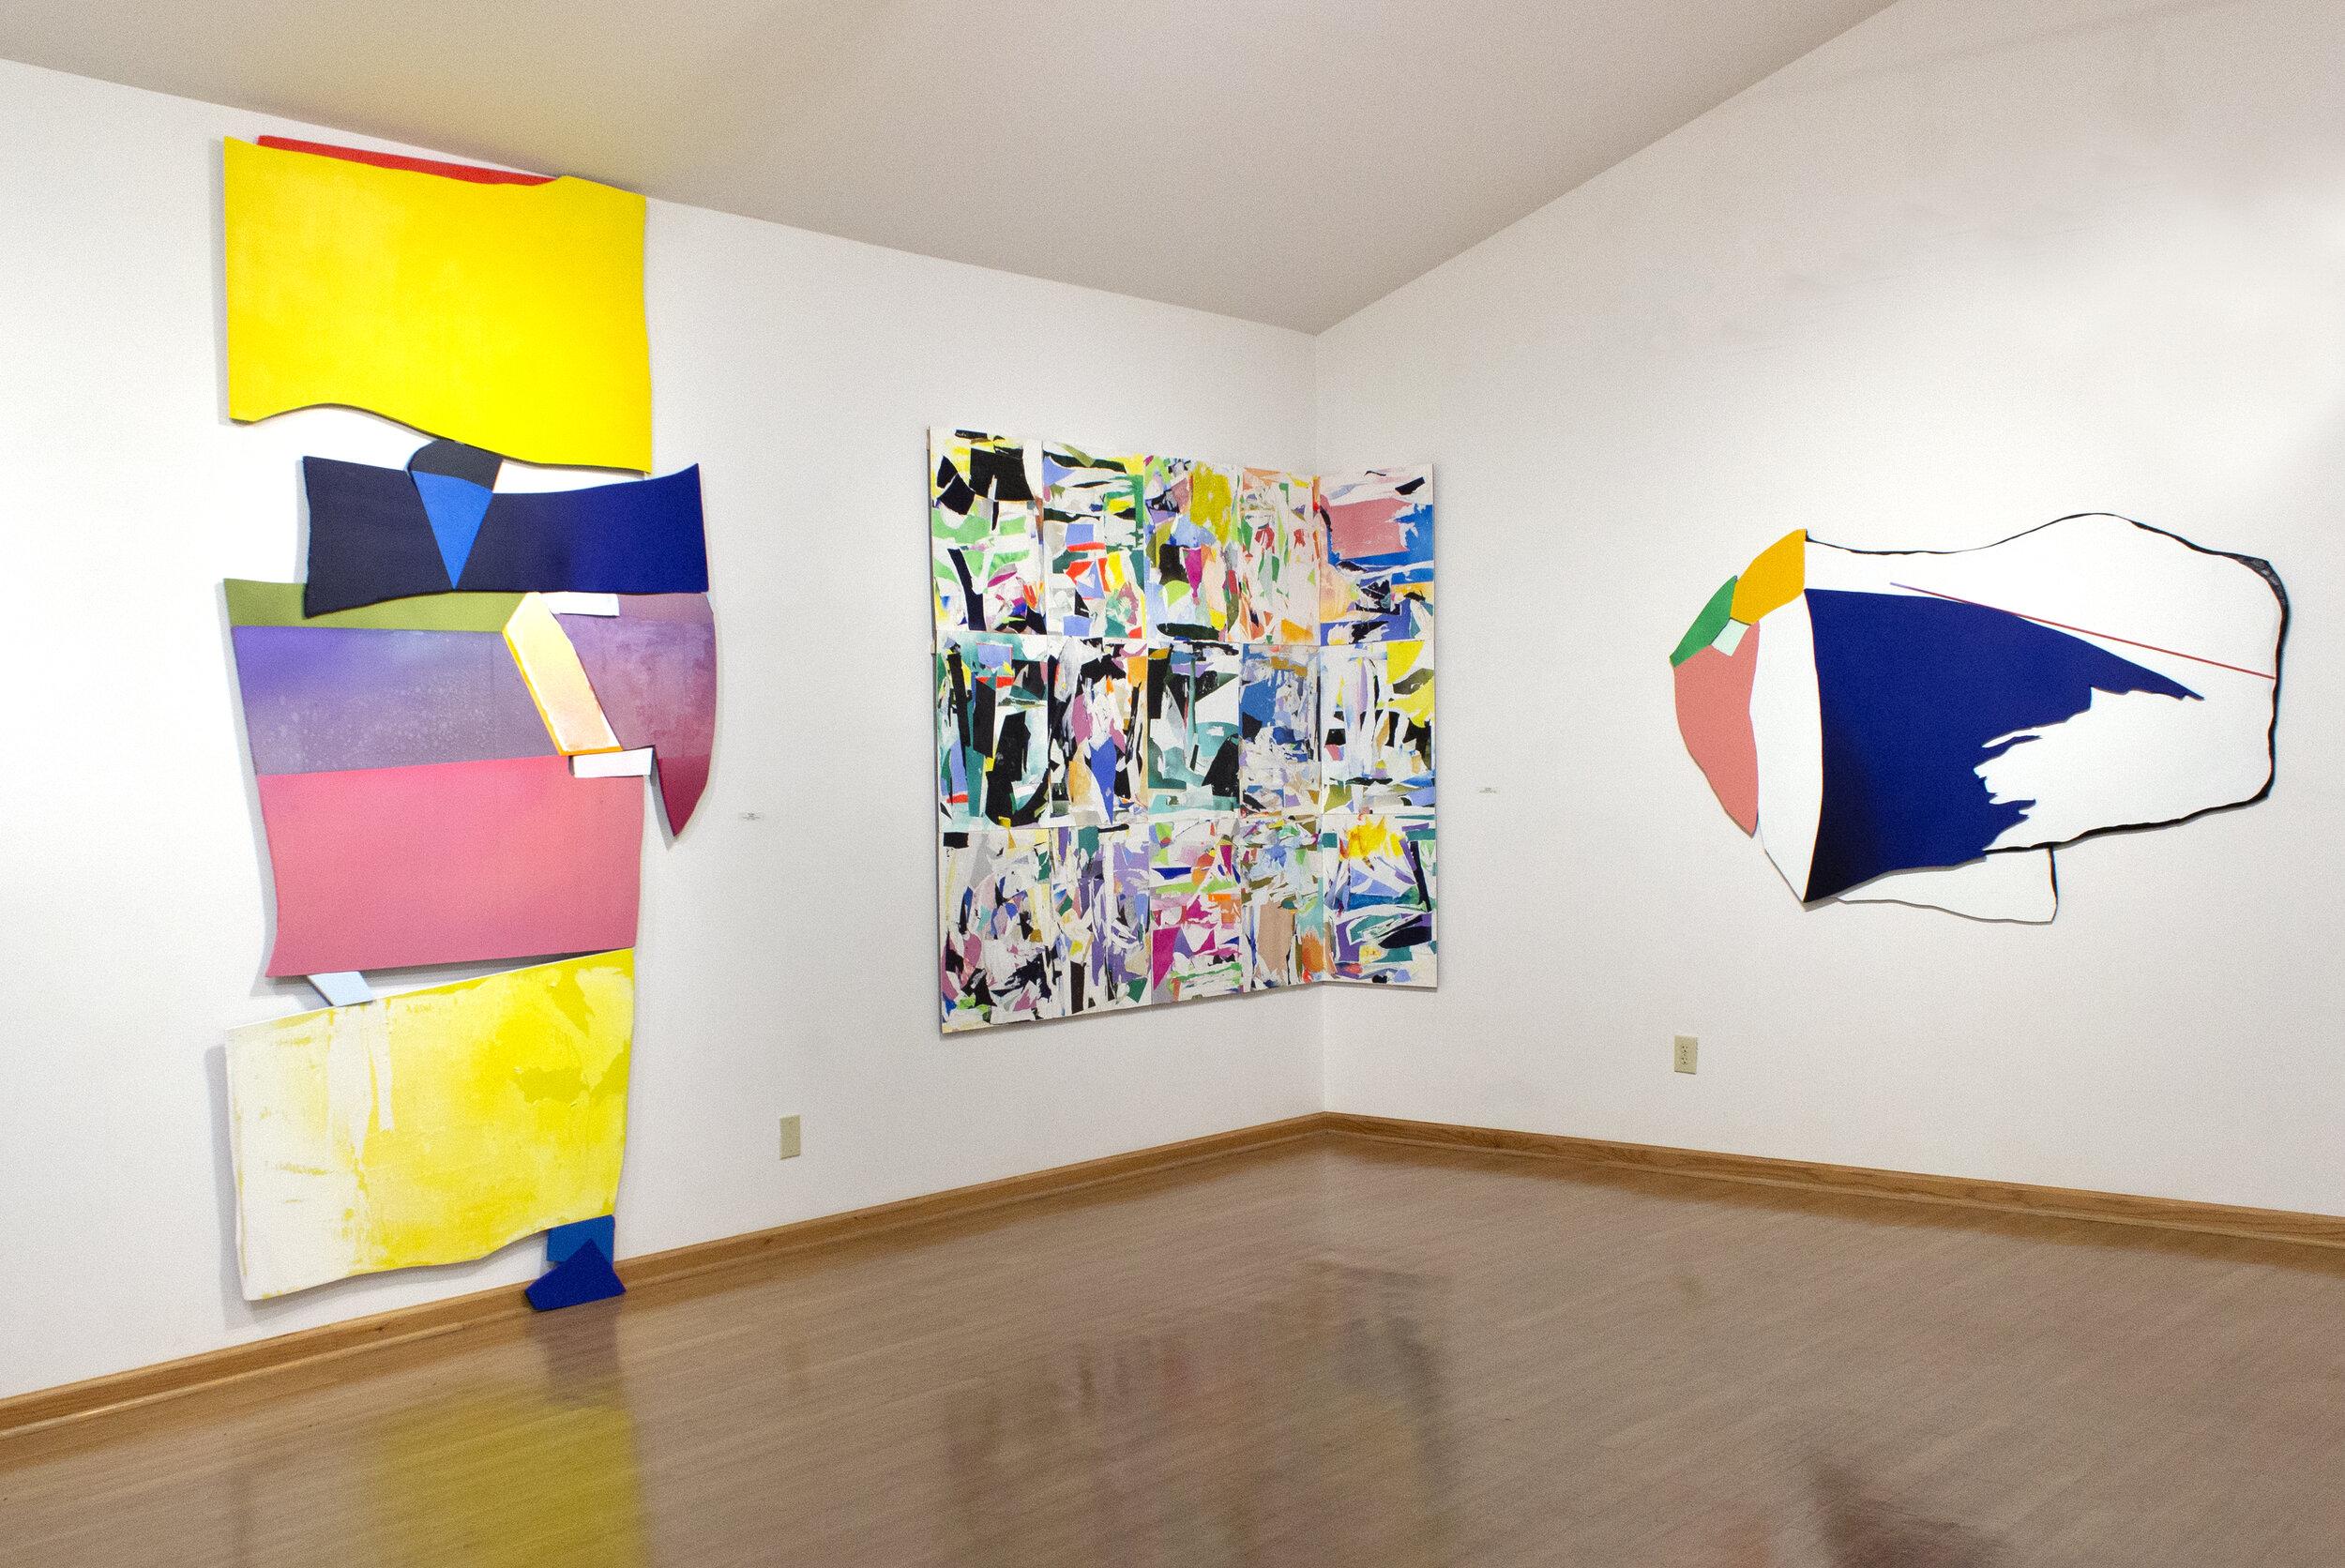 Install, Turner Center for the Arts, Valdosta, GA